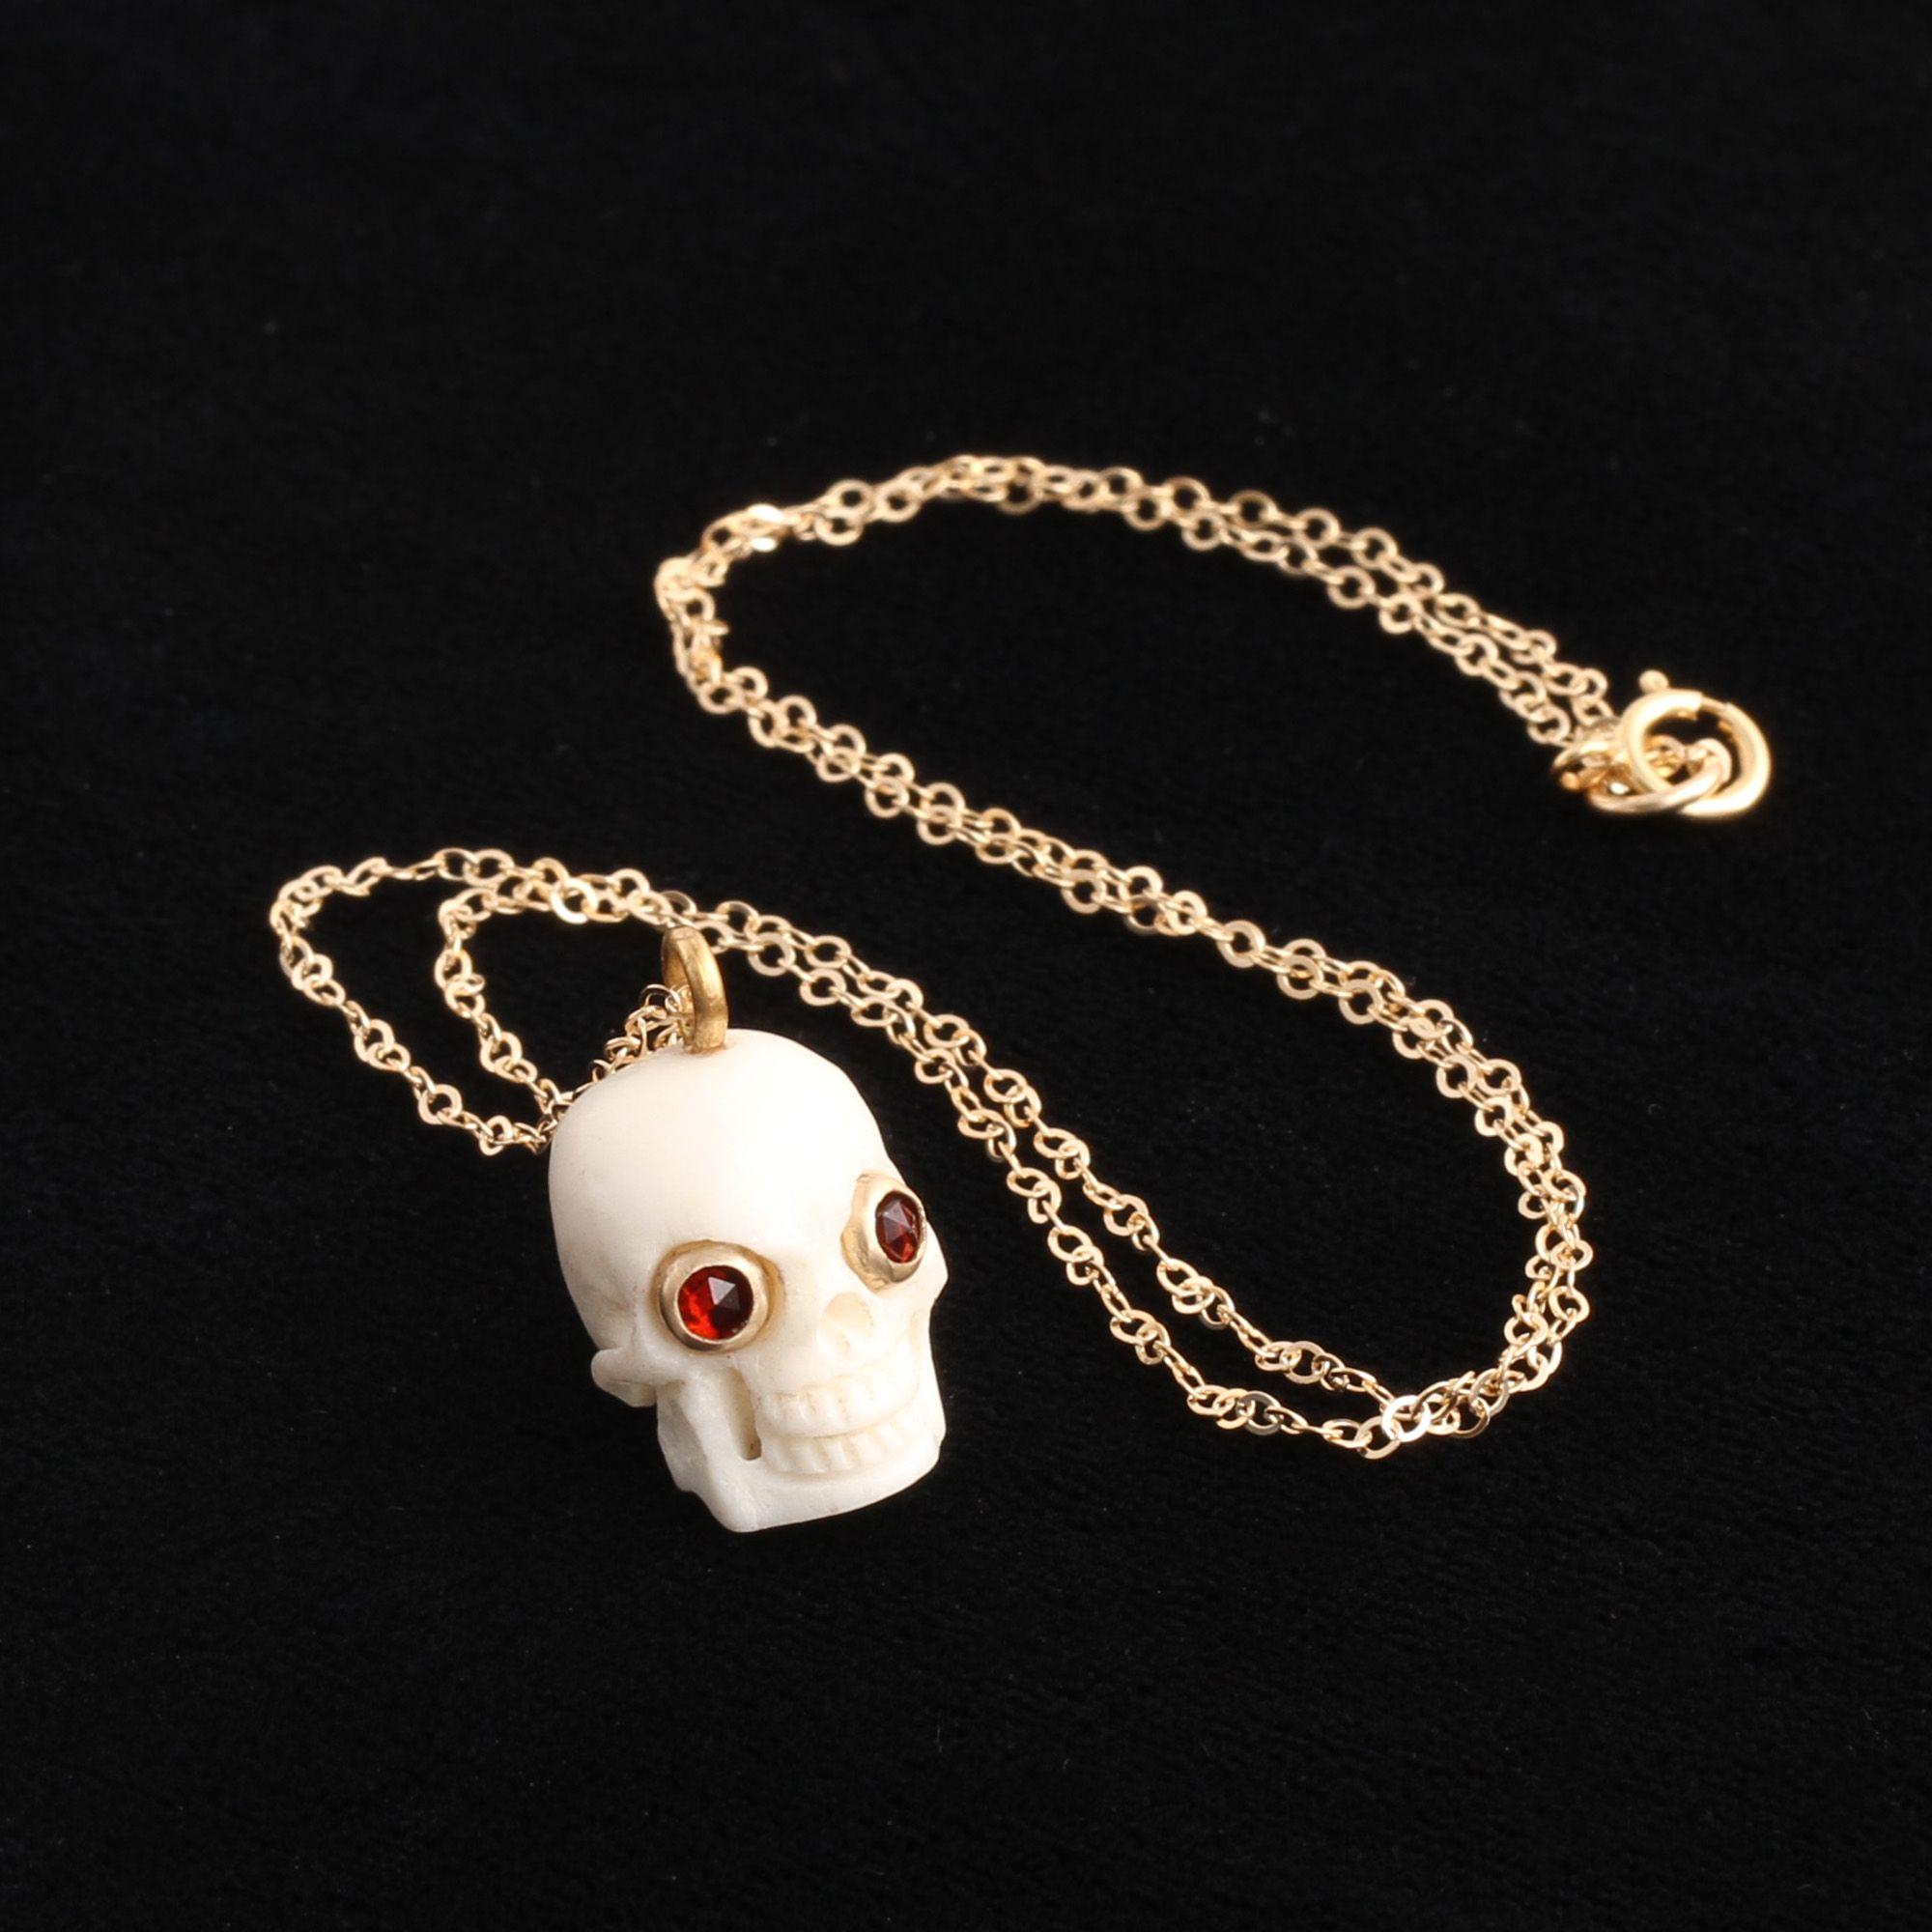 Memento Mori Skull Amulet (White)